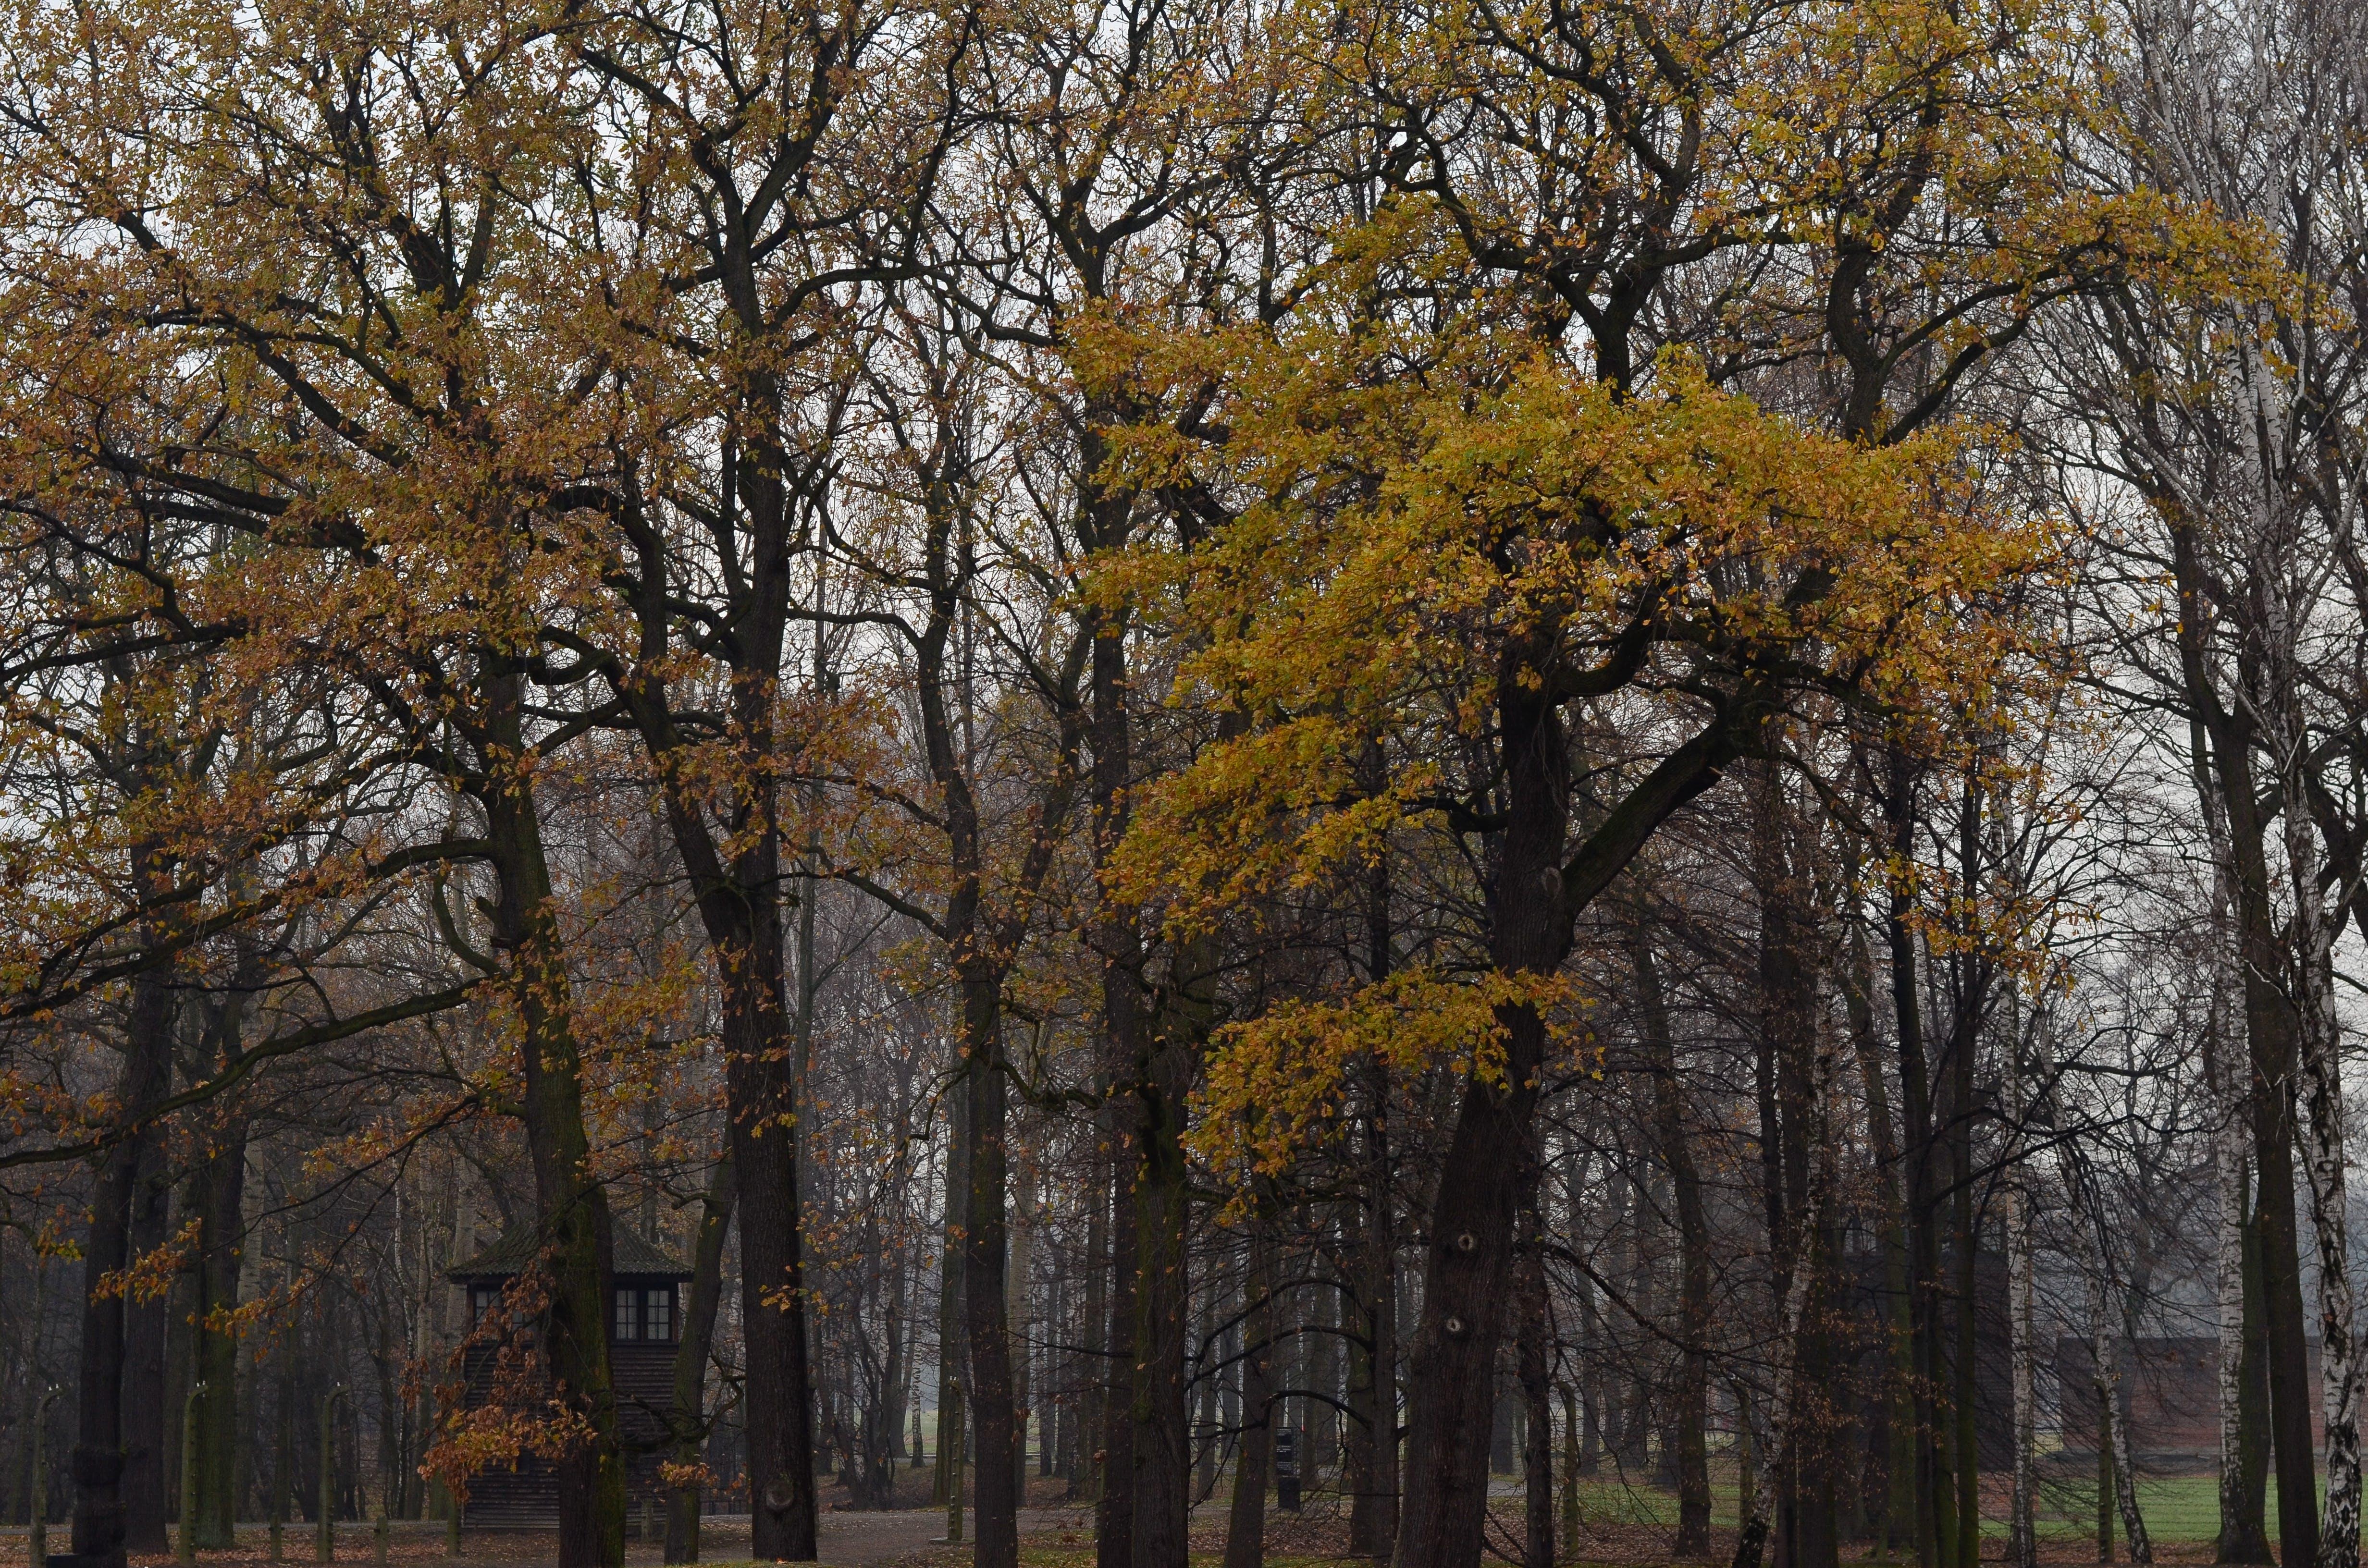 bäume, tageslicht, umwelt